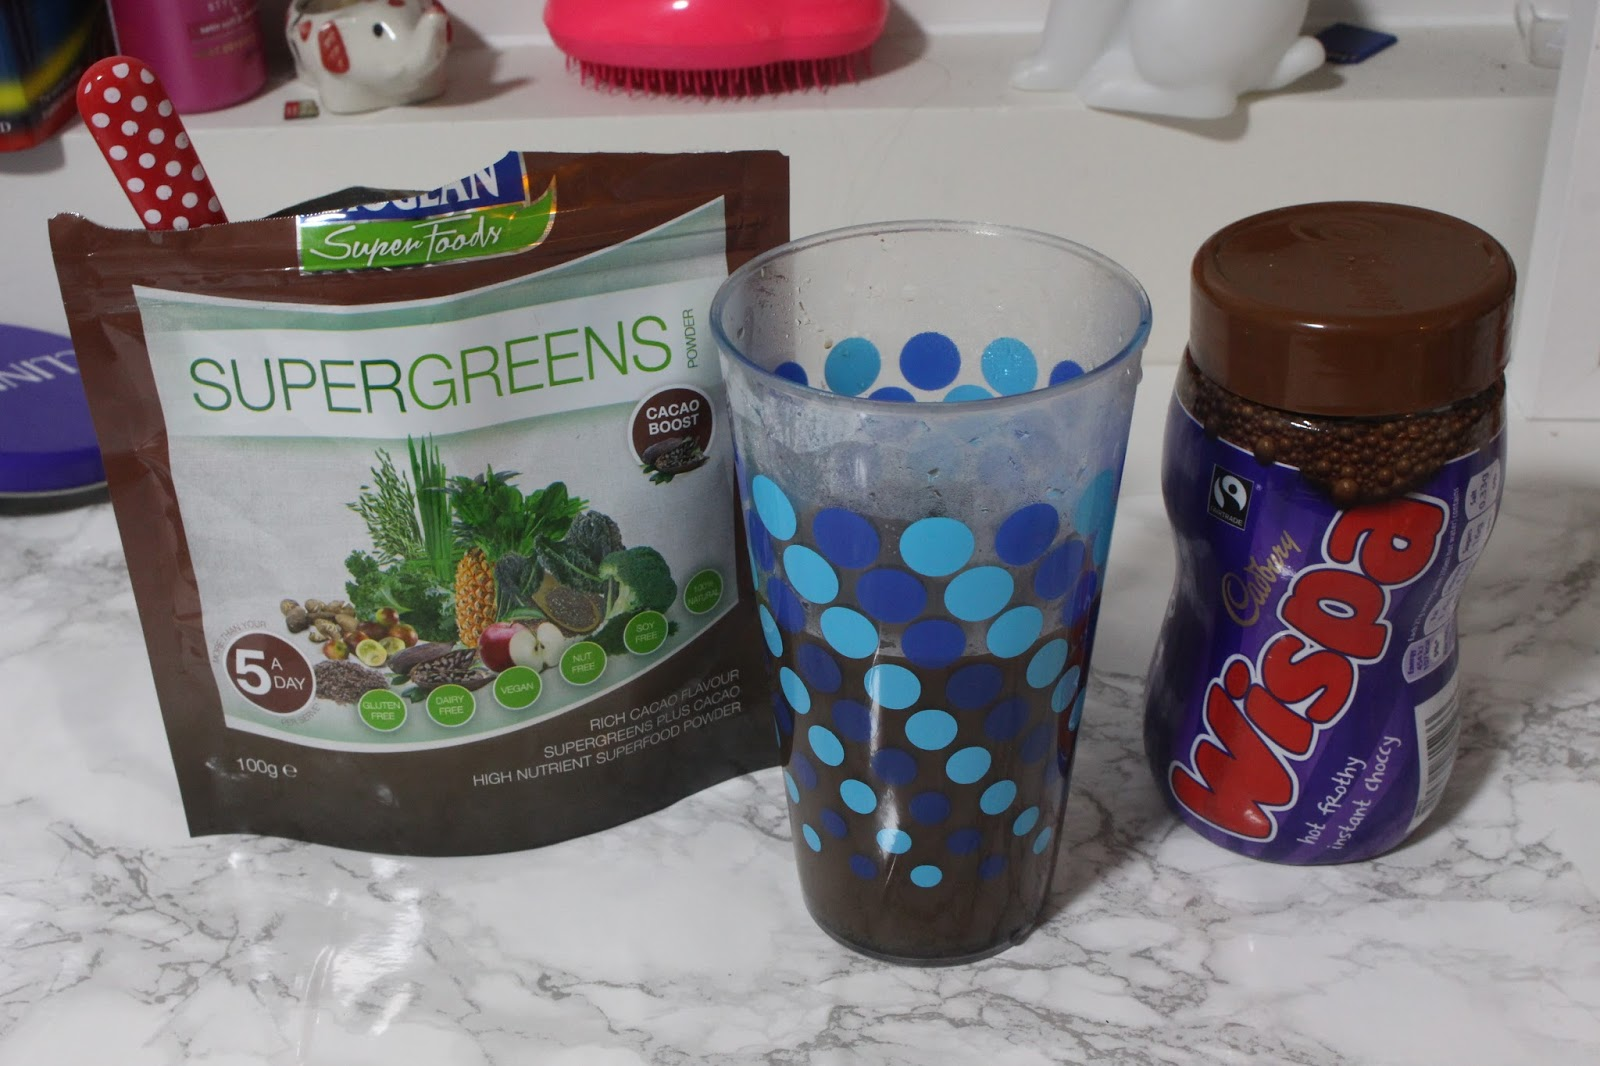 supergreen superfoods Bioglan Wispa